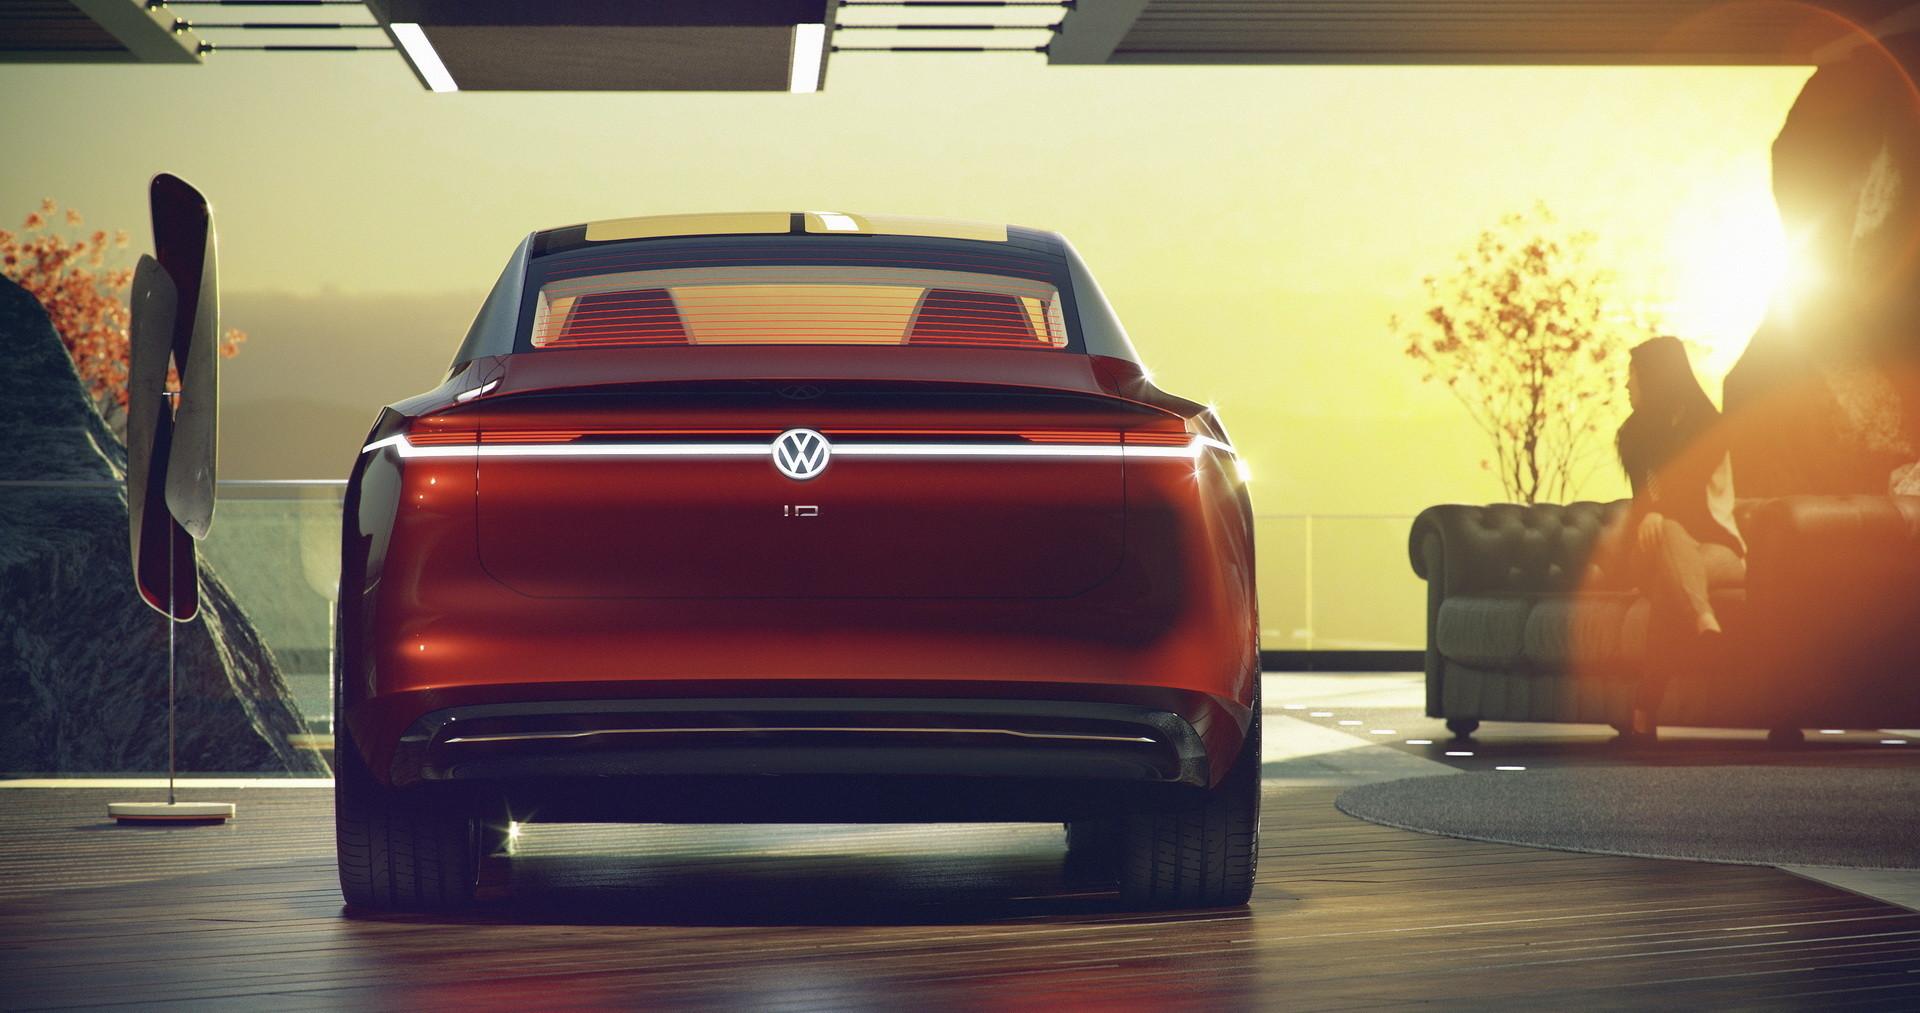 VW vizzion 2018 ID